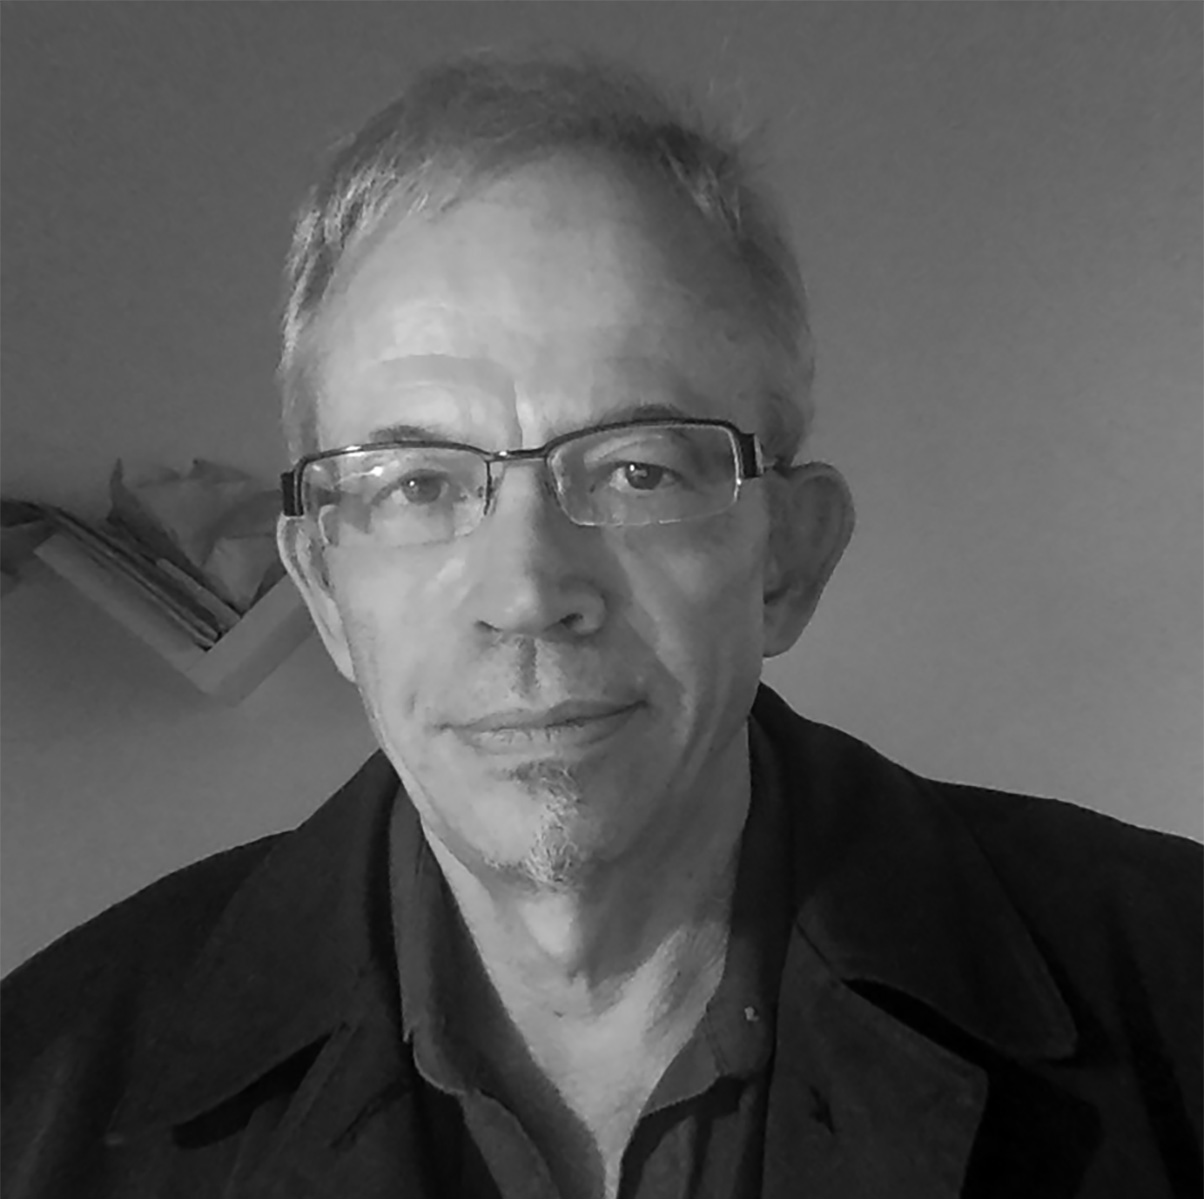 Image of Richard Hunt